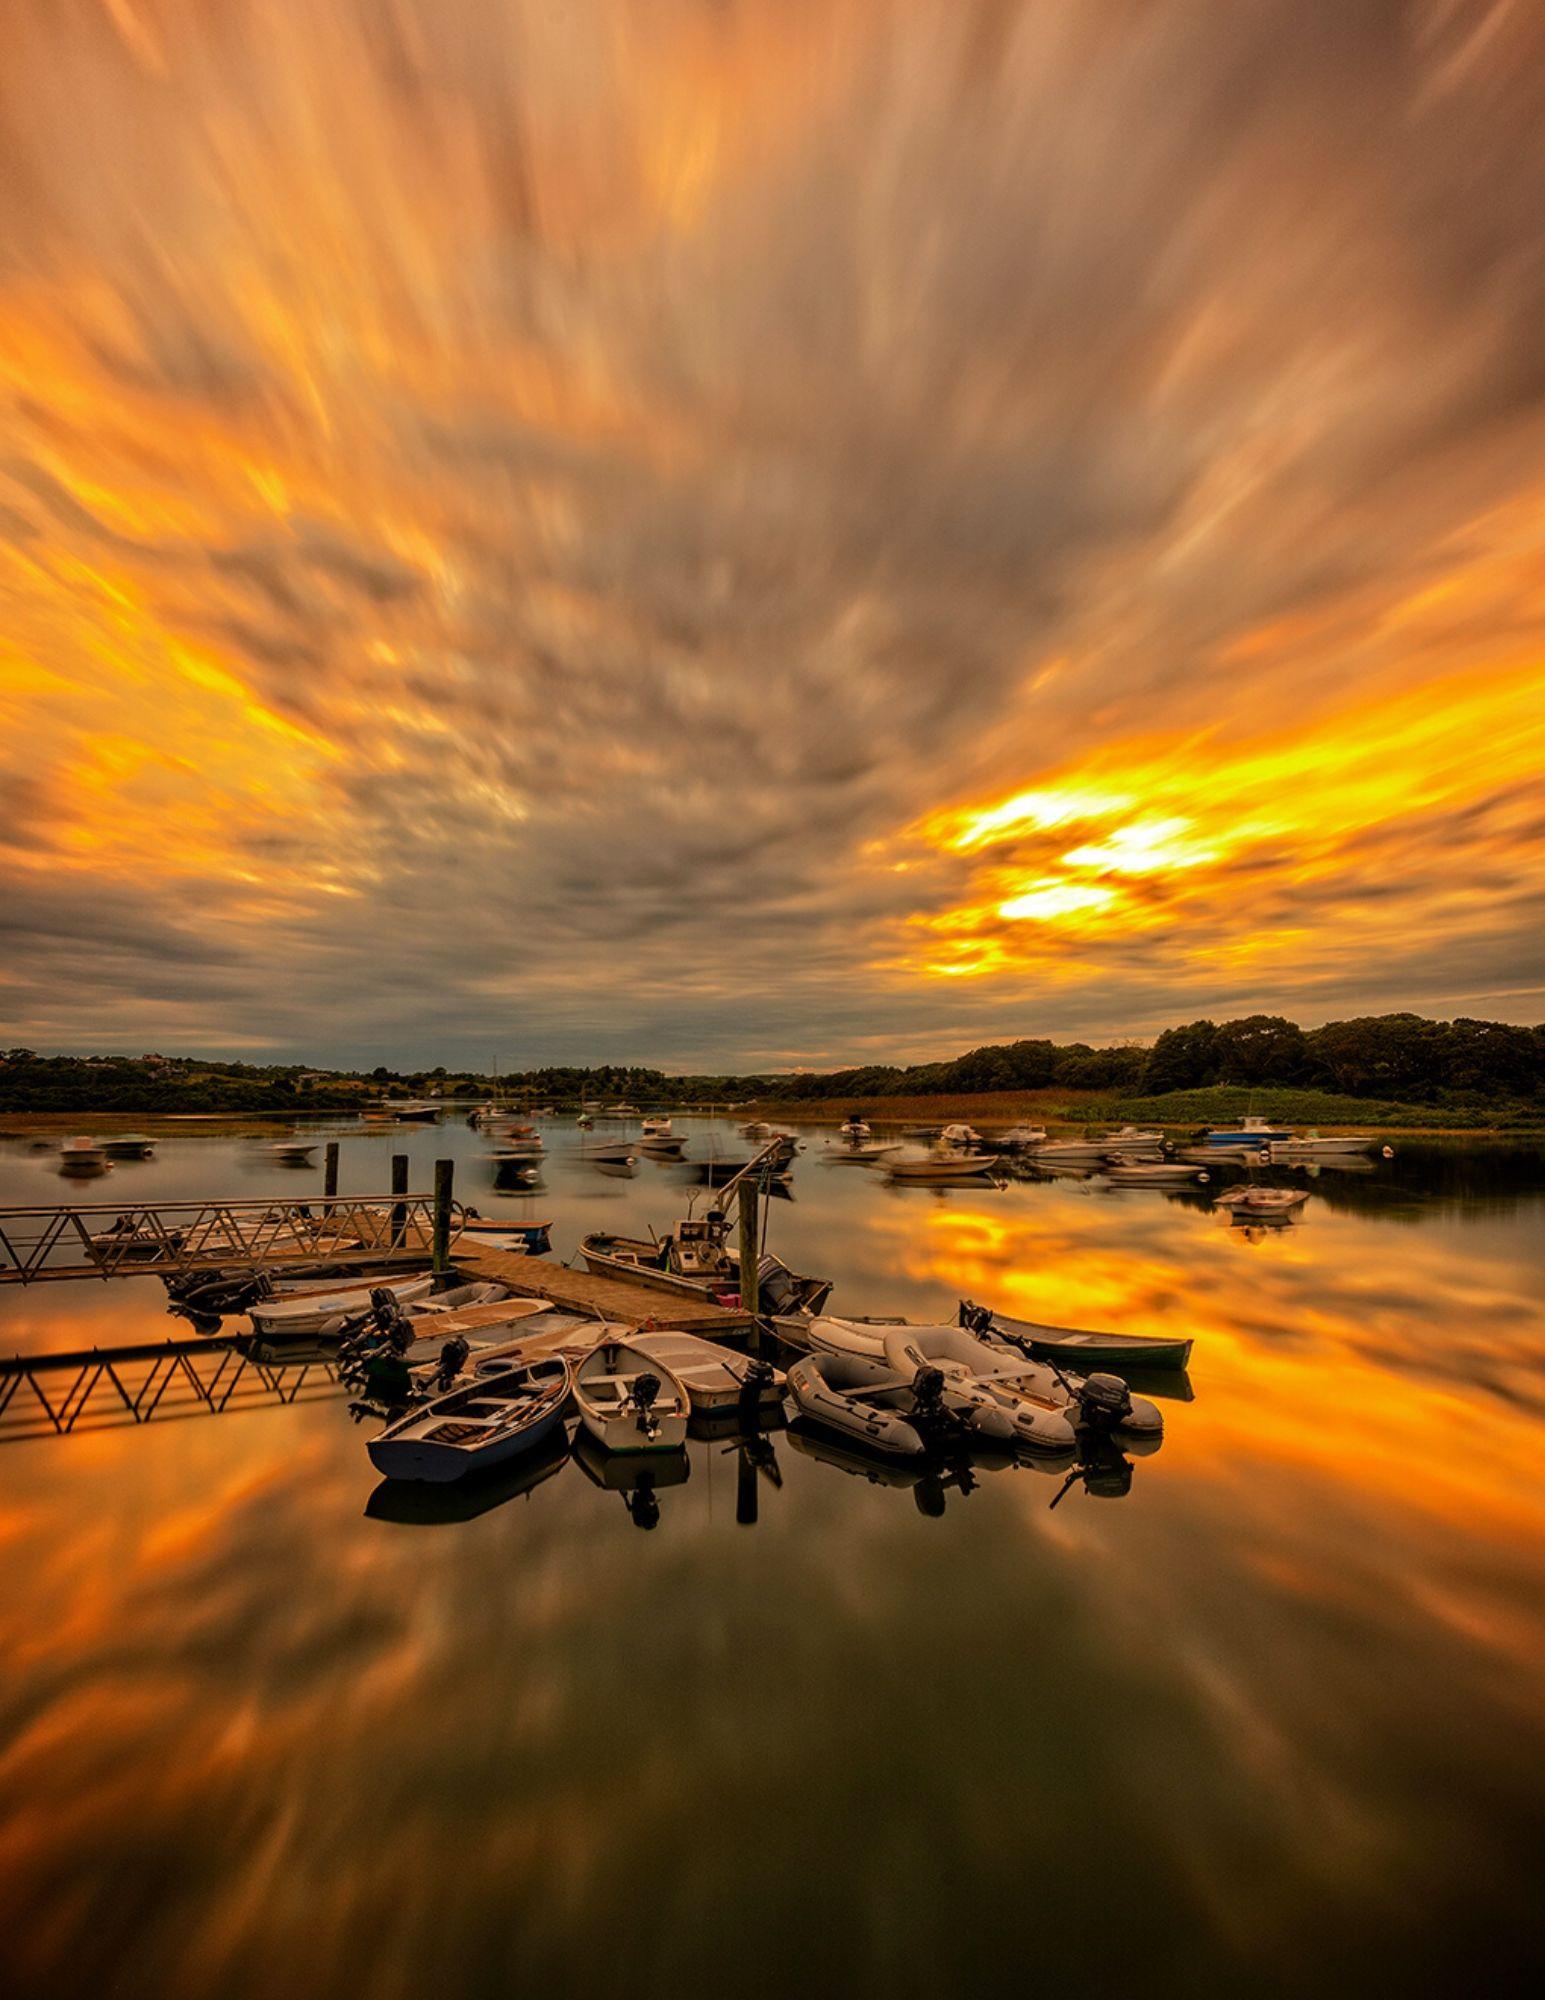 John Montes Jr Photography Best Places to Photograph Sunrise and Sunset on Marthas Vineyard-Best Places to Photograph Sunrise and Sunset on Marthas Vineyard-30